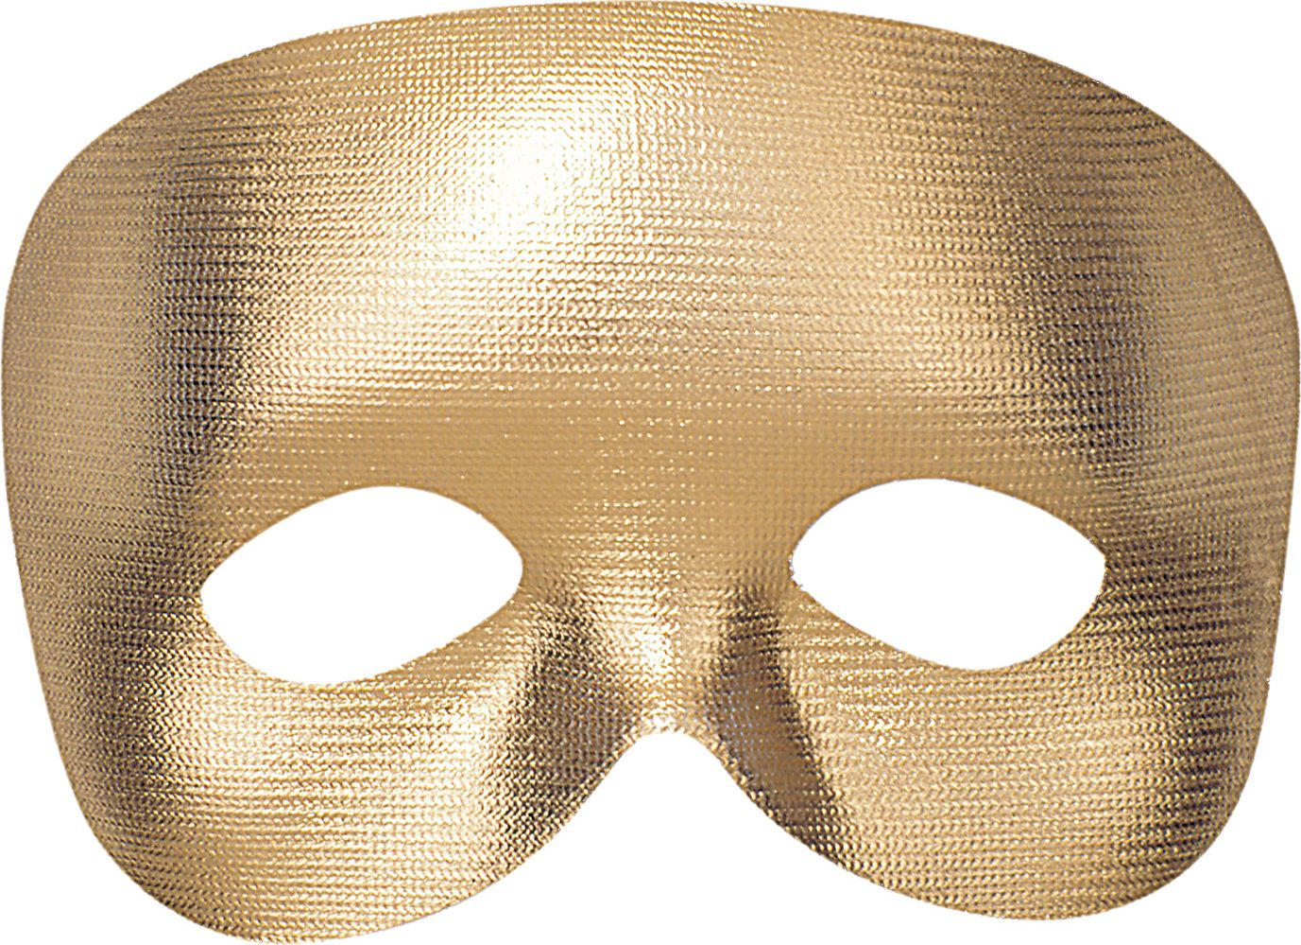 Fantoom oogmasker goud